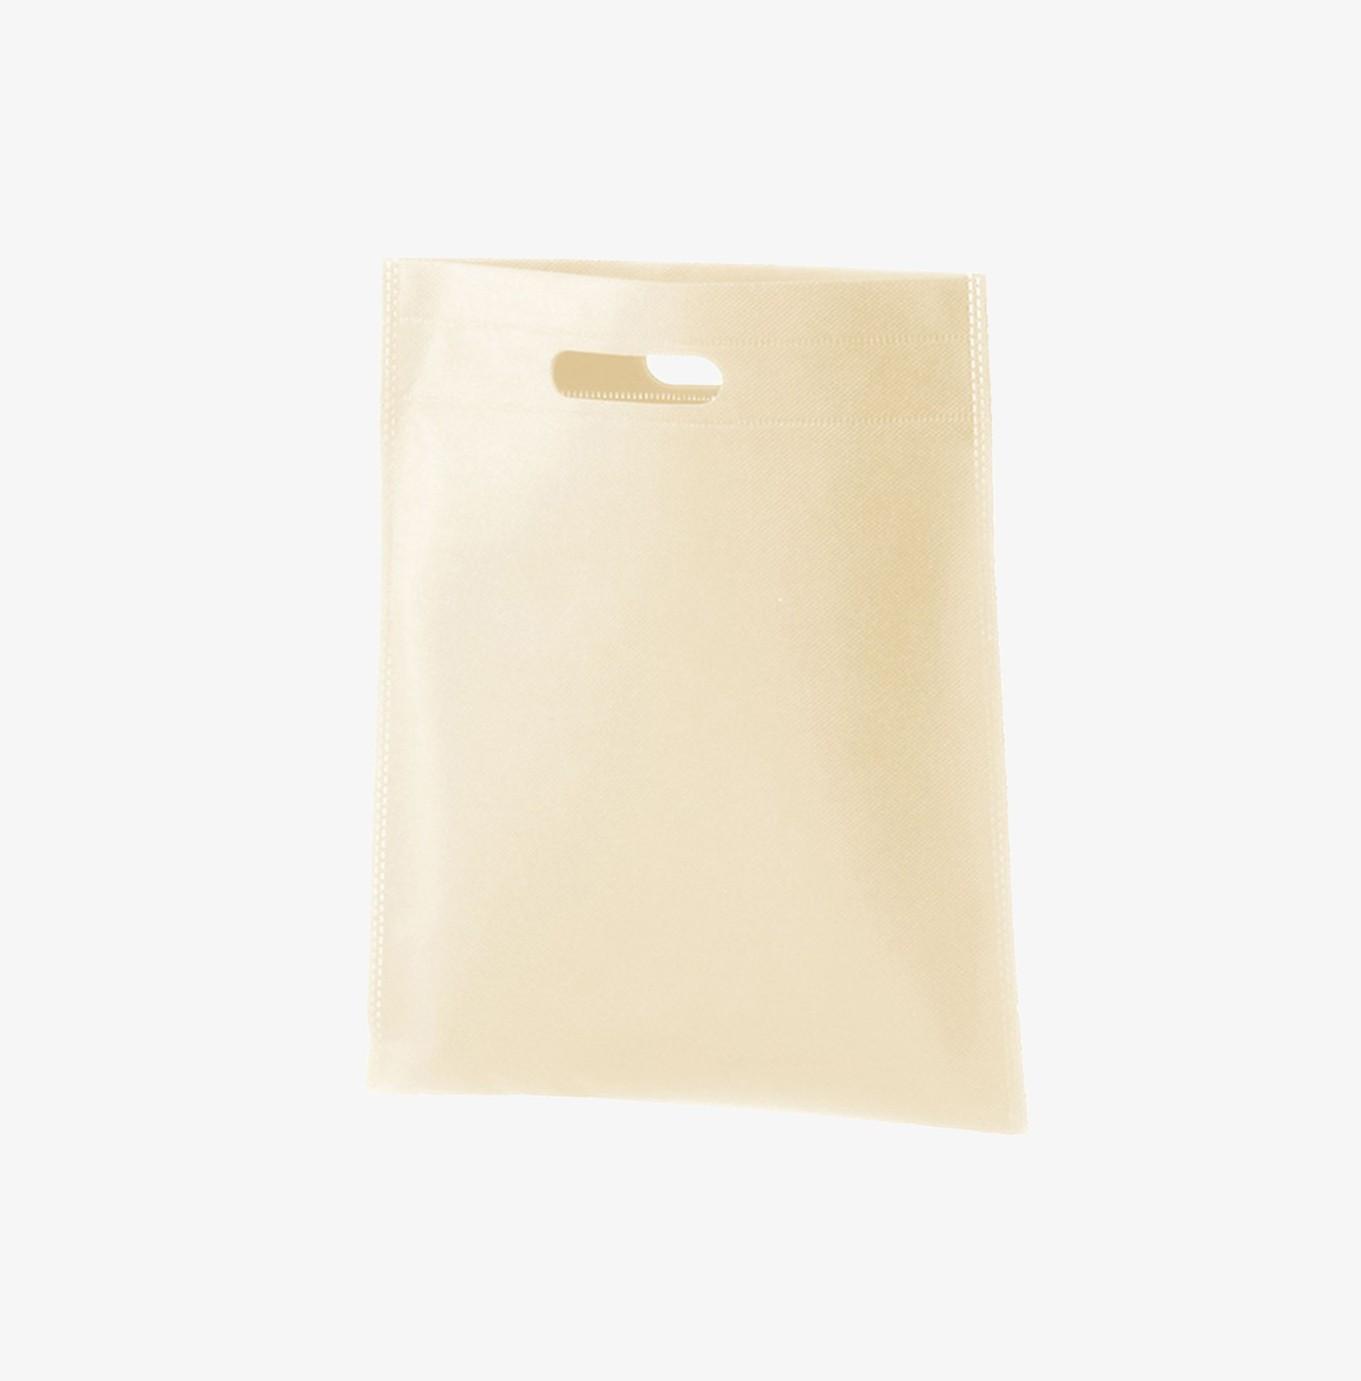 PKD20x30MB 米白色平口袋 20x30cm